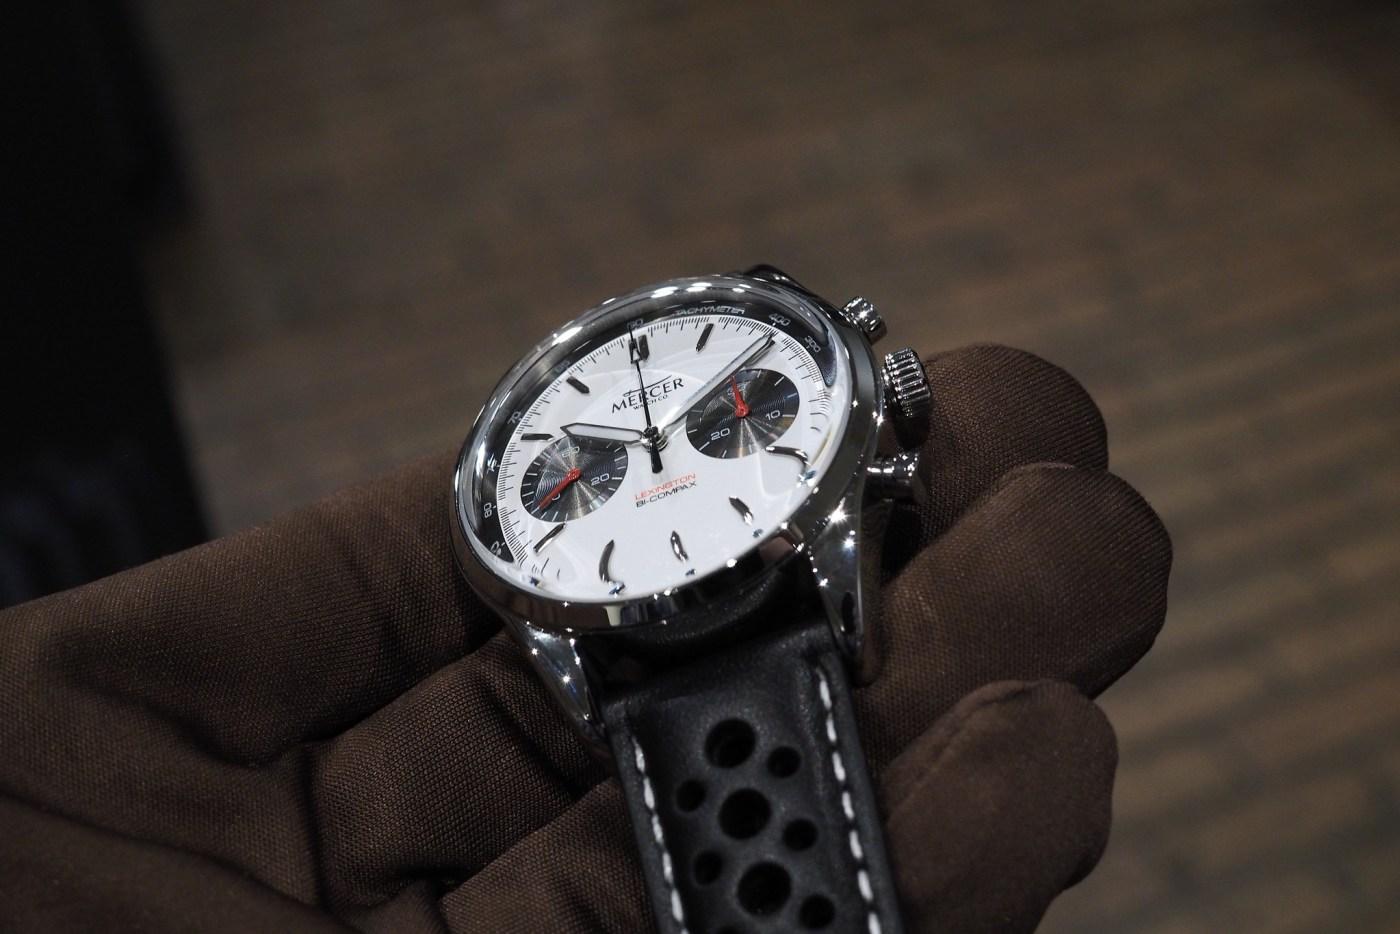 Mercer Watch Co Panda Dial Chronograph